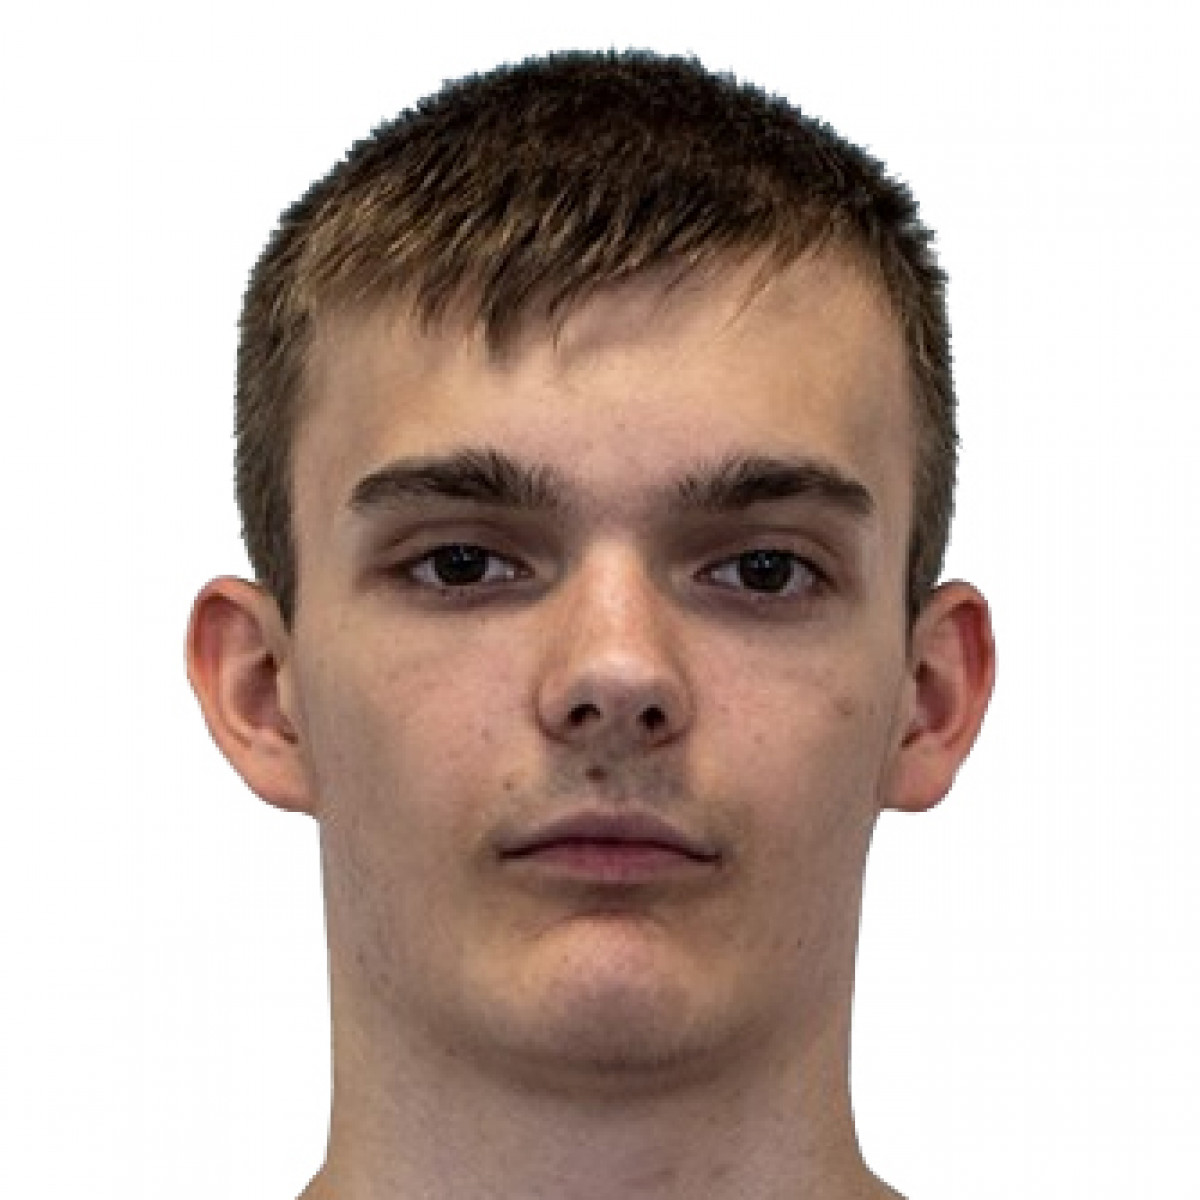 Mihail Kombakov